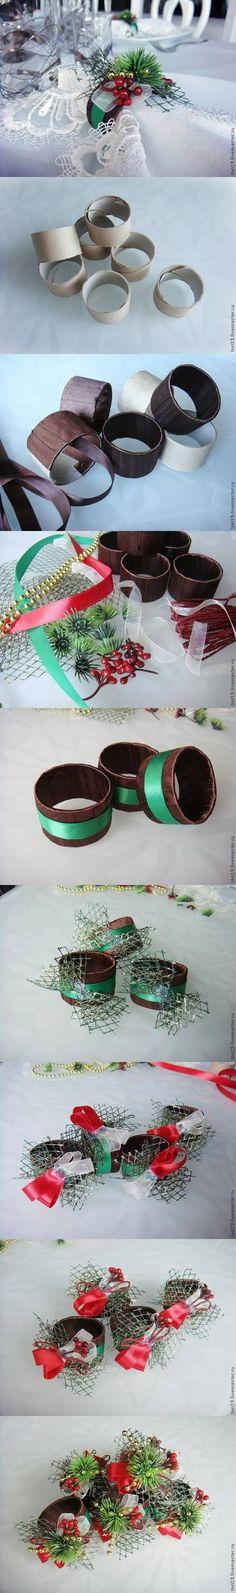 Aseo DIY rollo de papel decorativos anillos de servilleta | iCreativeIdeas.com igual que nosotros en Facebook ==> https://www.facebook.com/icreativeideas: